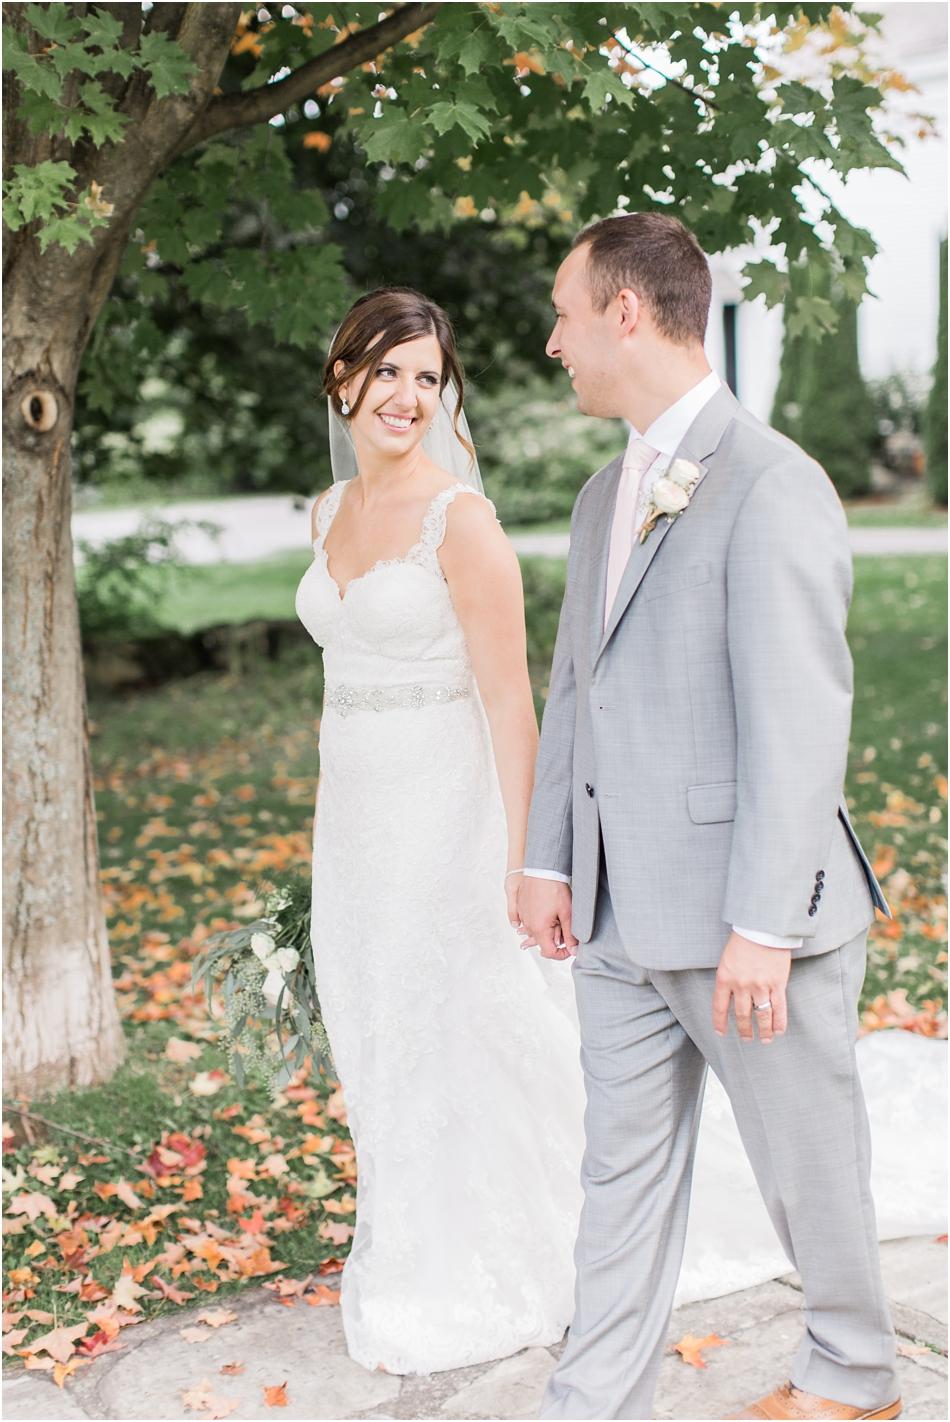 equinox_resort_golf_club_manchester_vermont_jennifer_matt_cape_cod_boston_new_england_wedding_photographer_Meredith_Jane_Photography_photo_2398.jpg